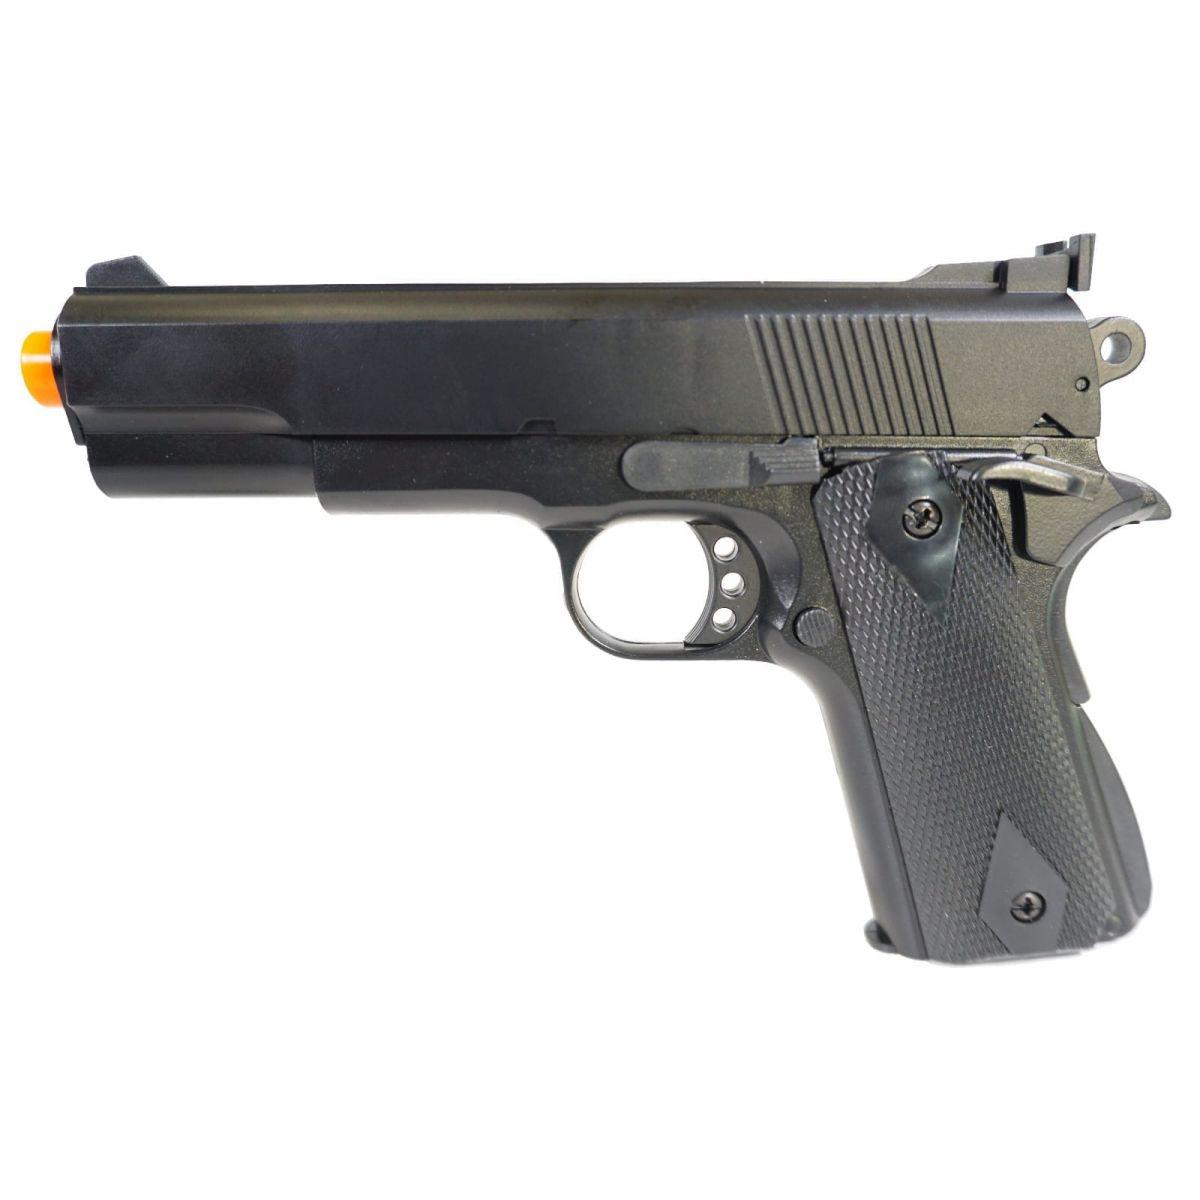 ha121 spring airsoft pistol